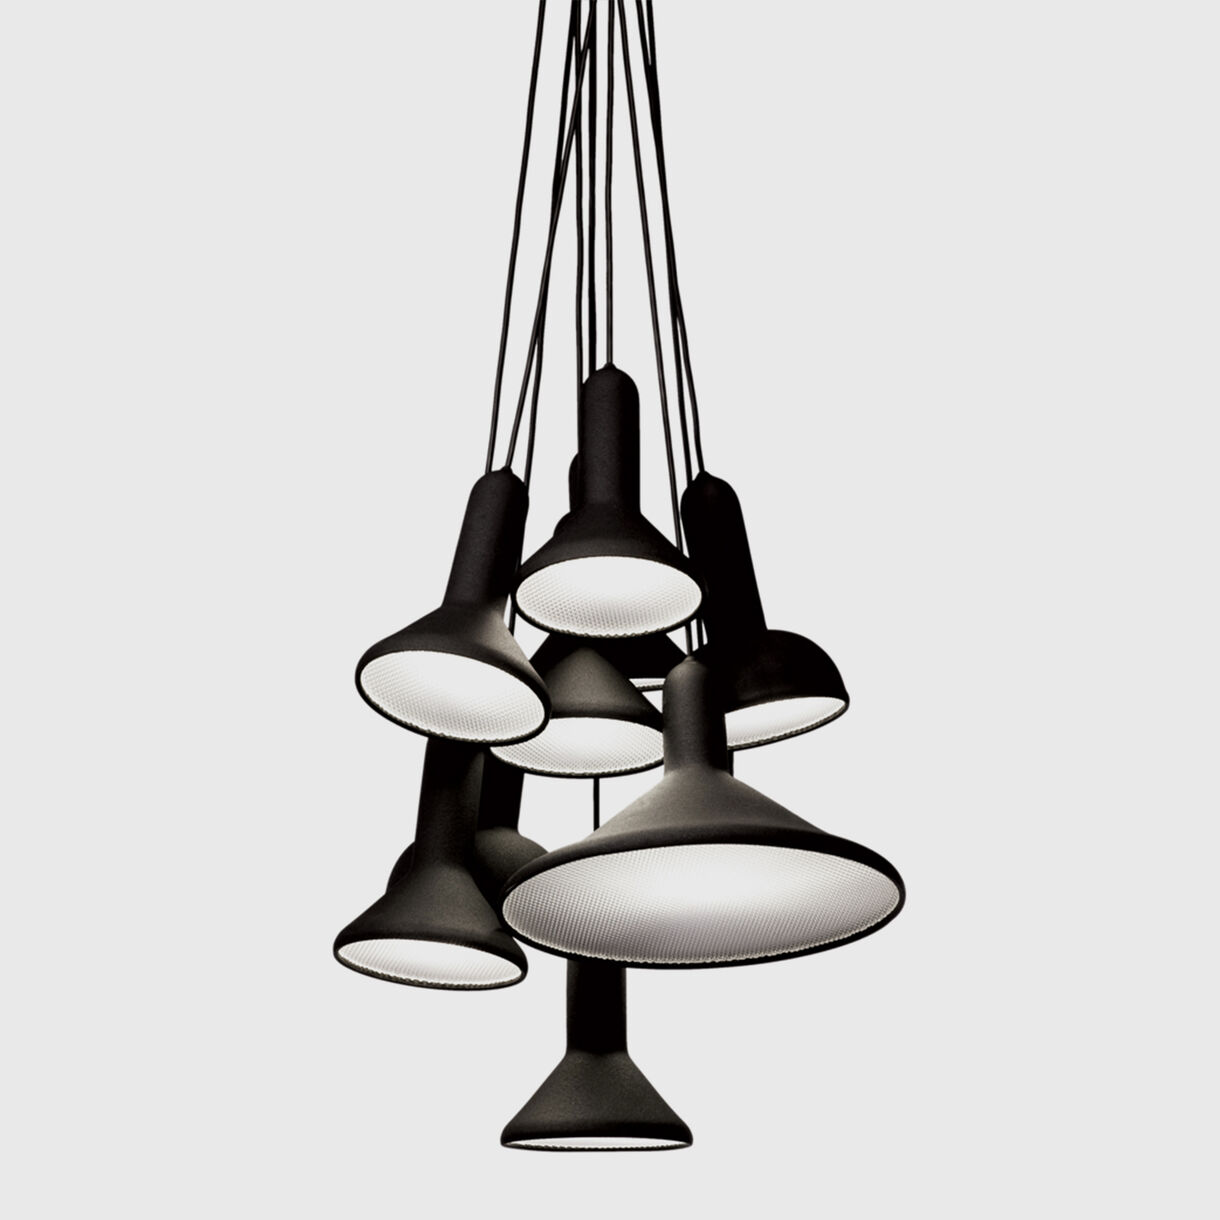 Torch Light, S10, Black